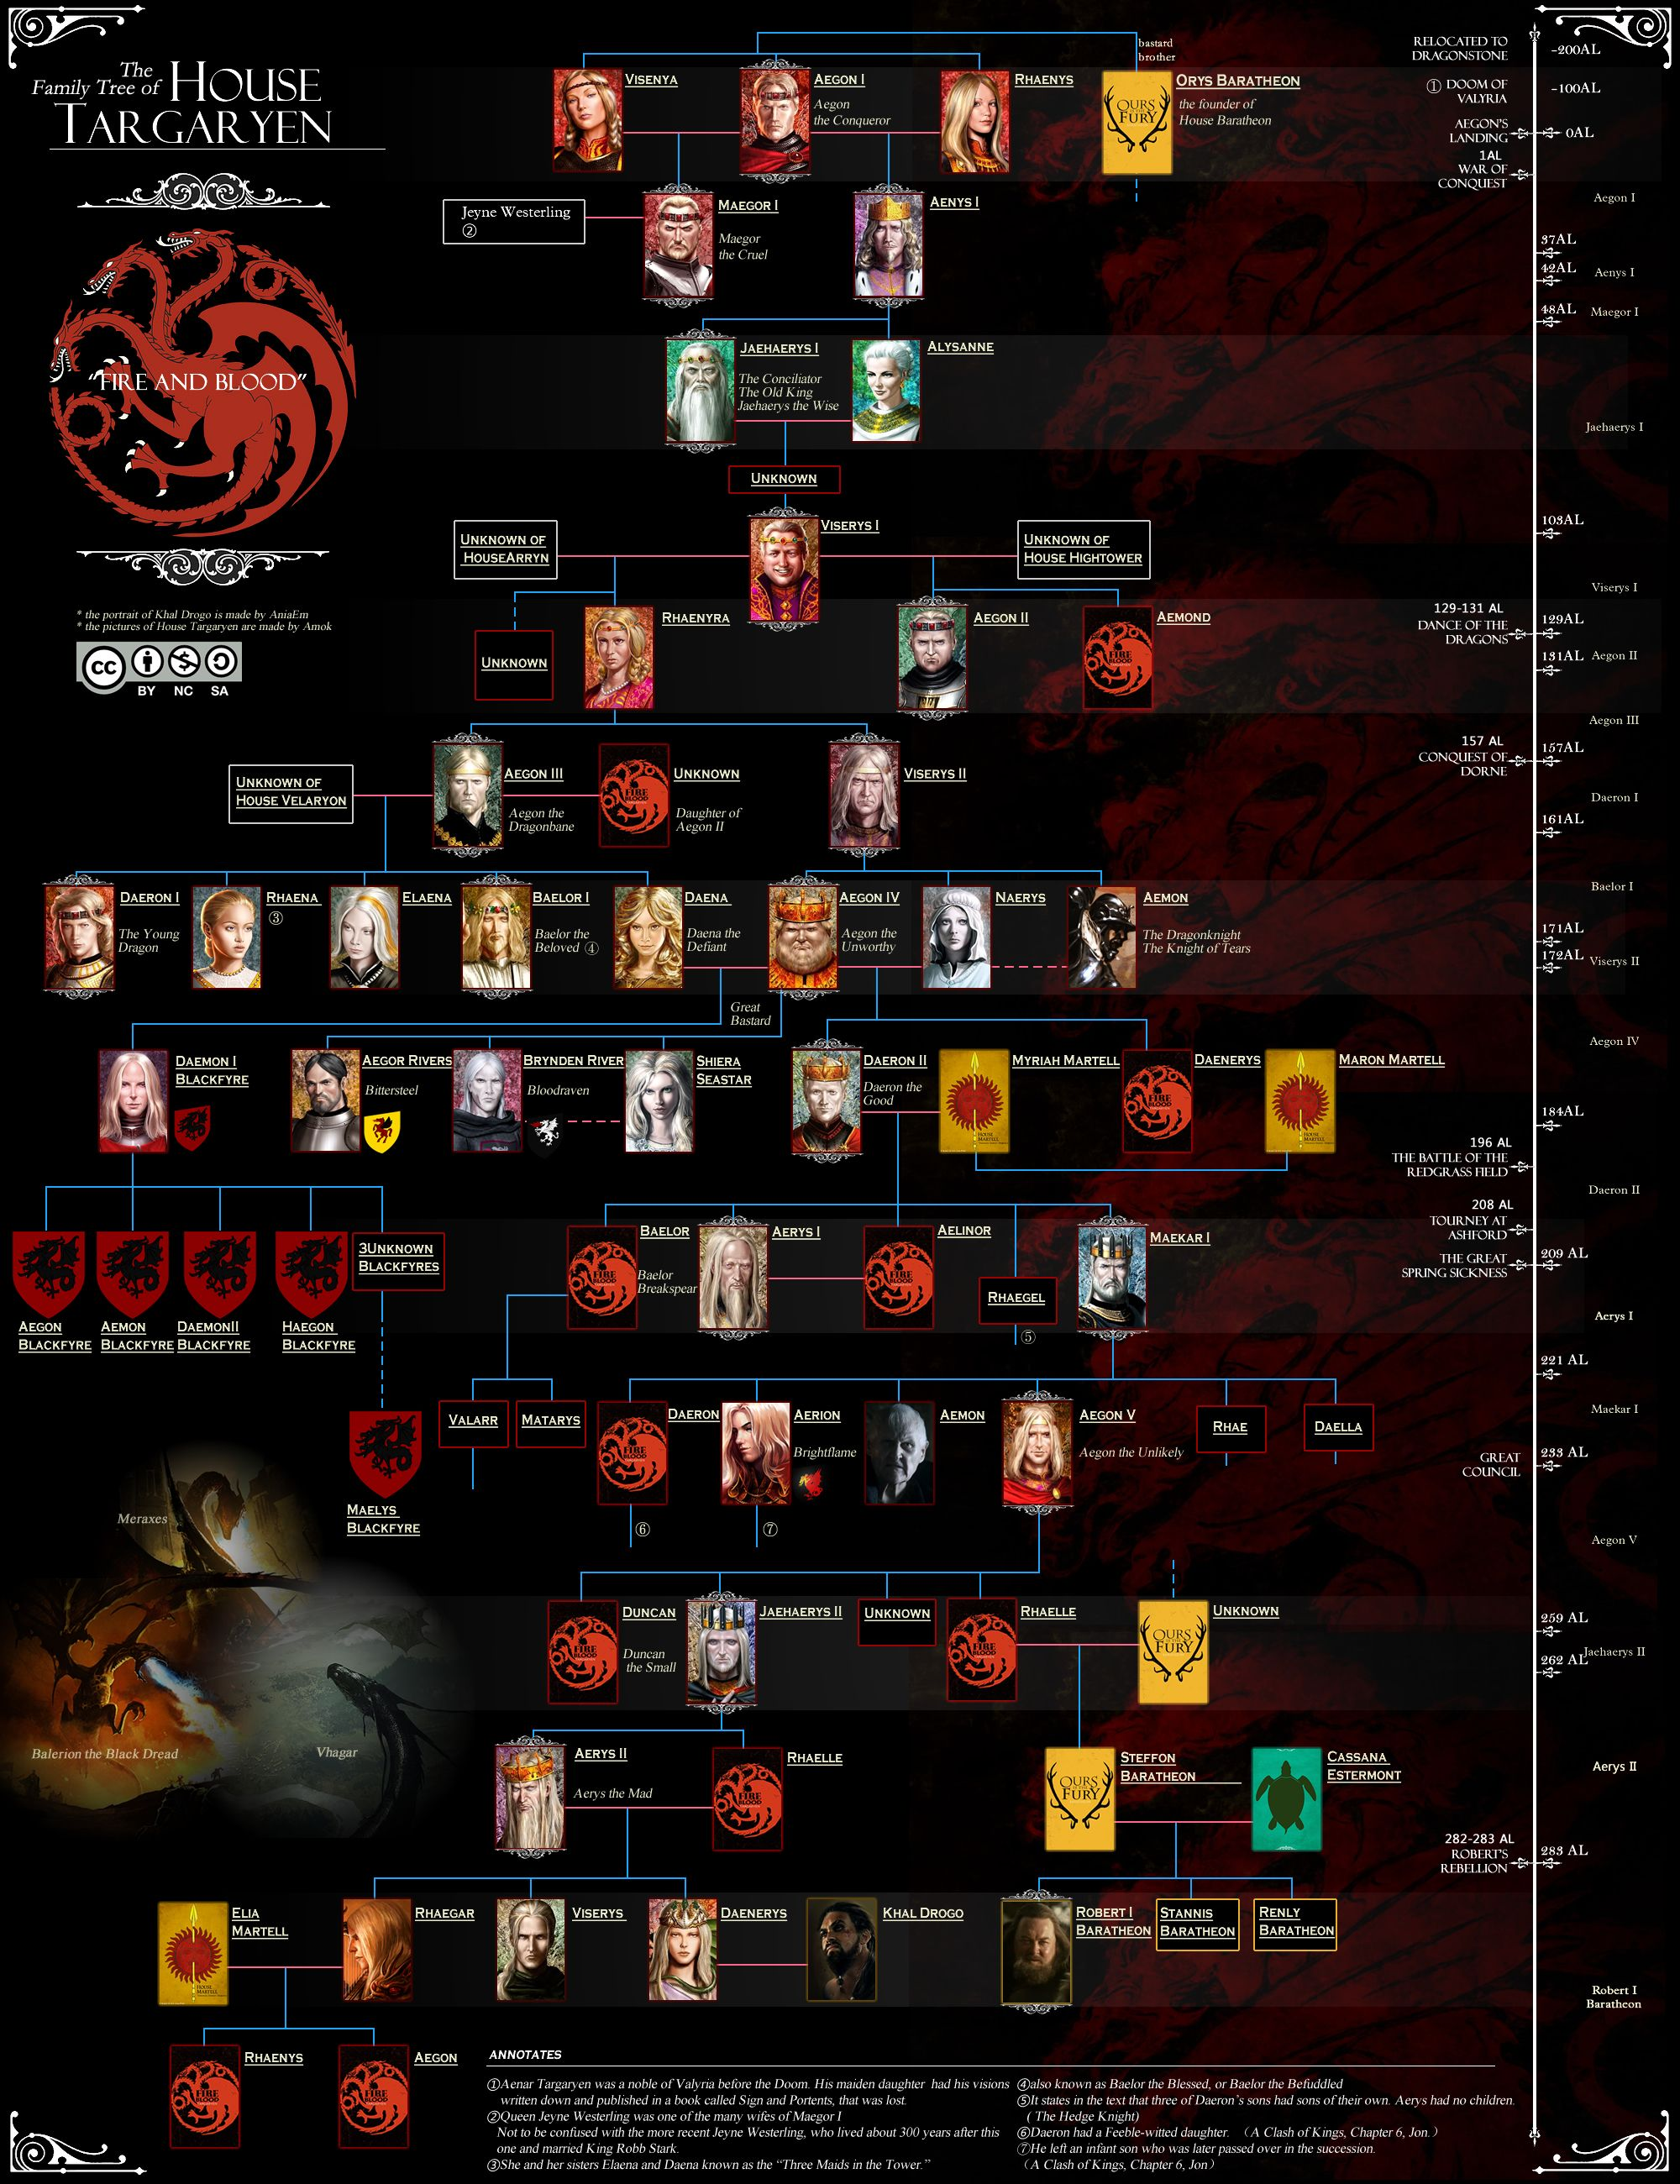 Famosos The Family Tree of House Targaryen (A Árvore Genealógica da Casa  IJ42